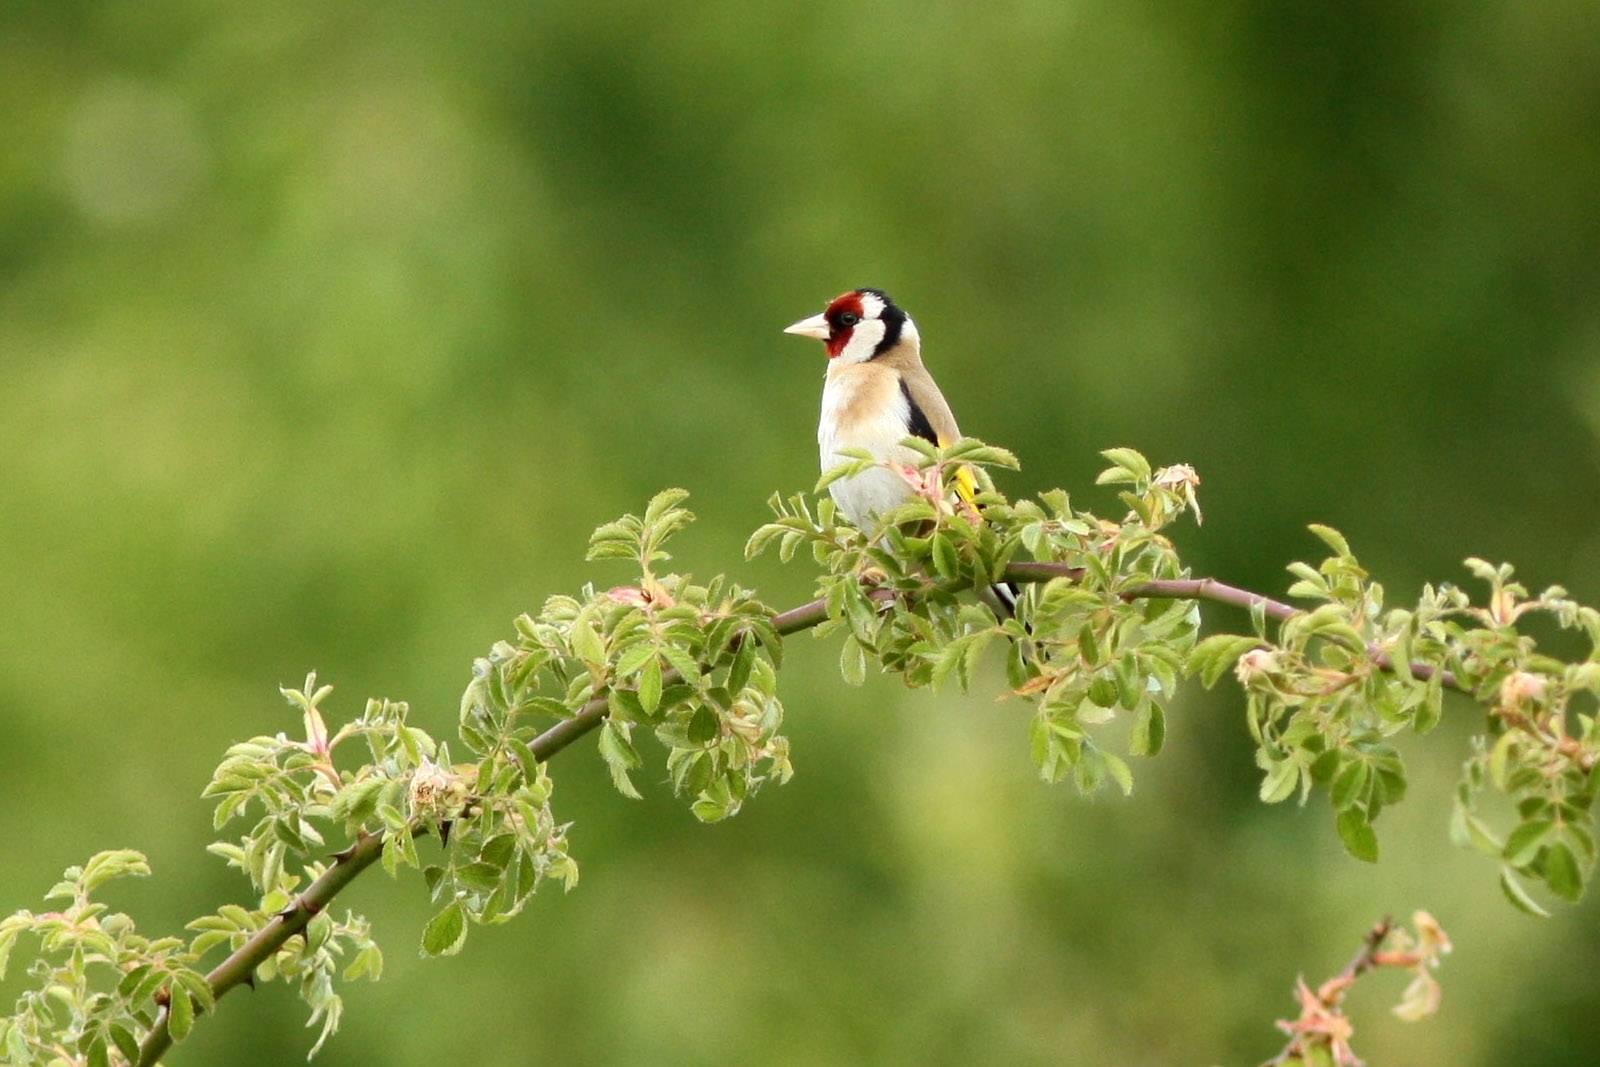 European Goldfinch (CHARDONNERET ELEGANTE)